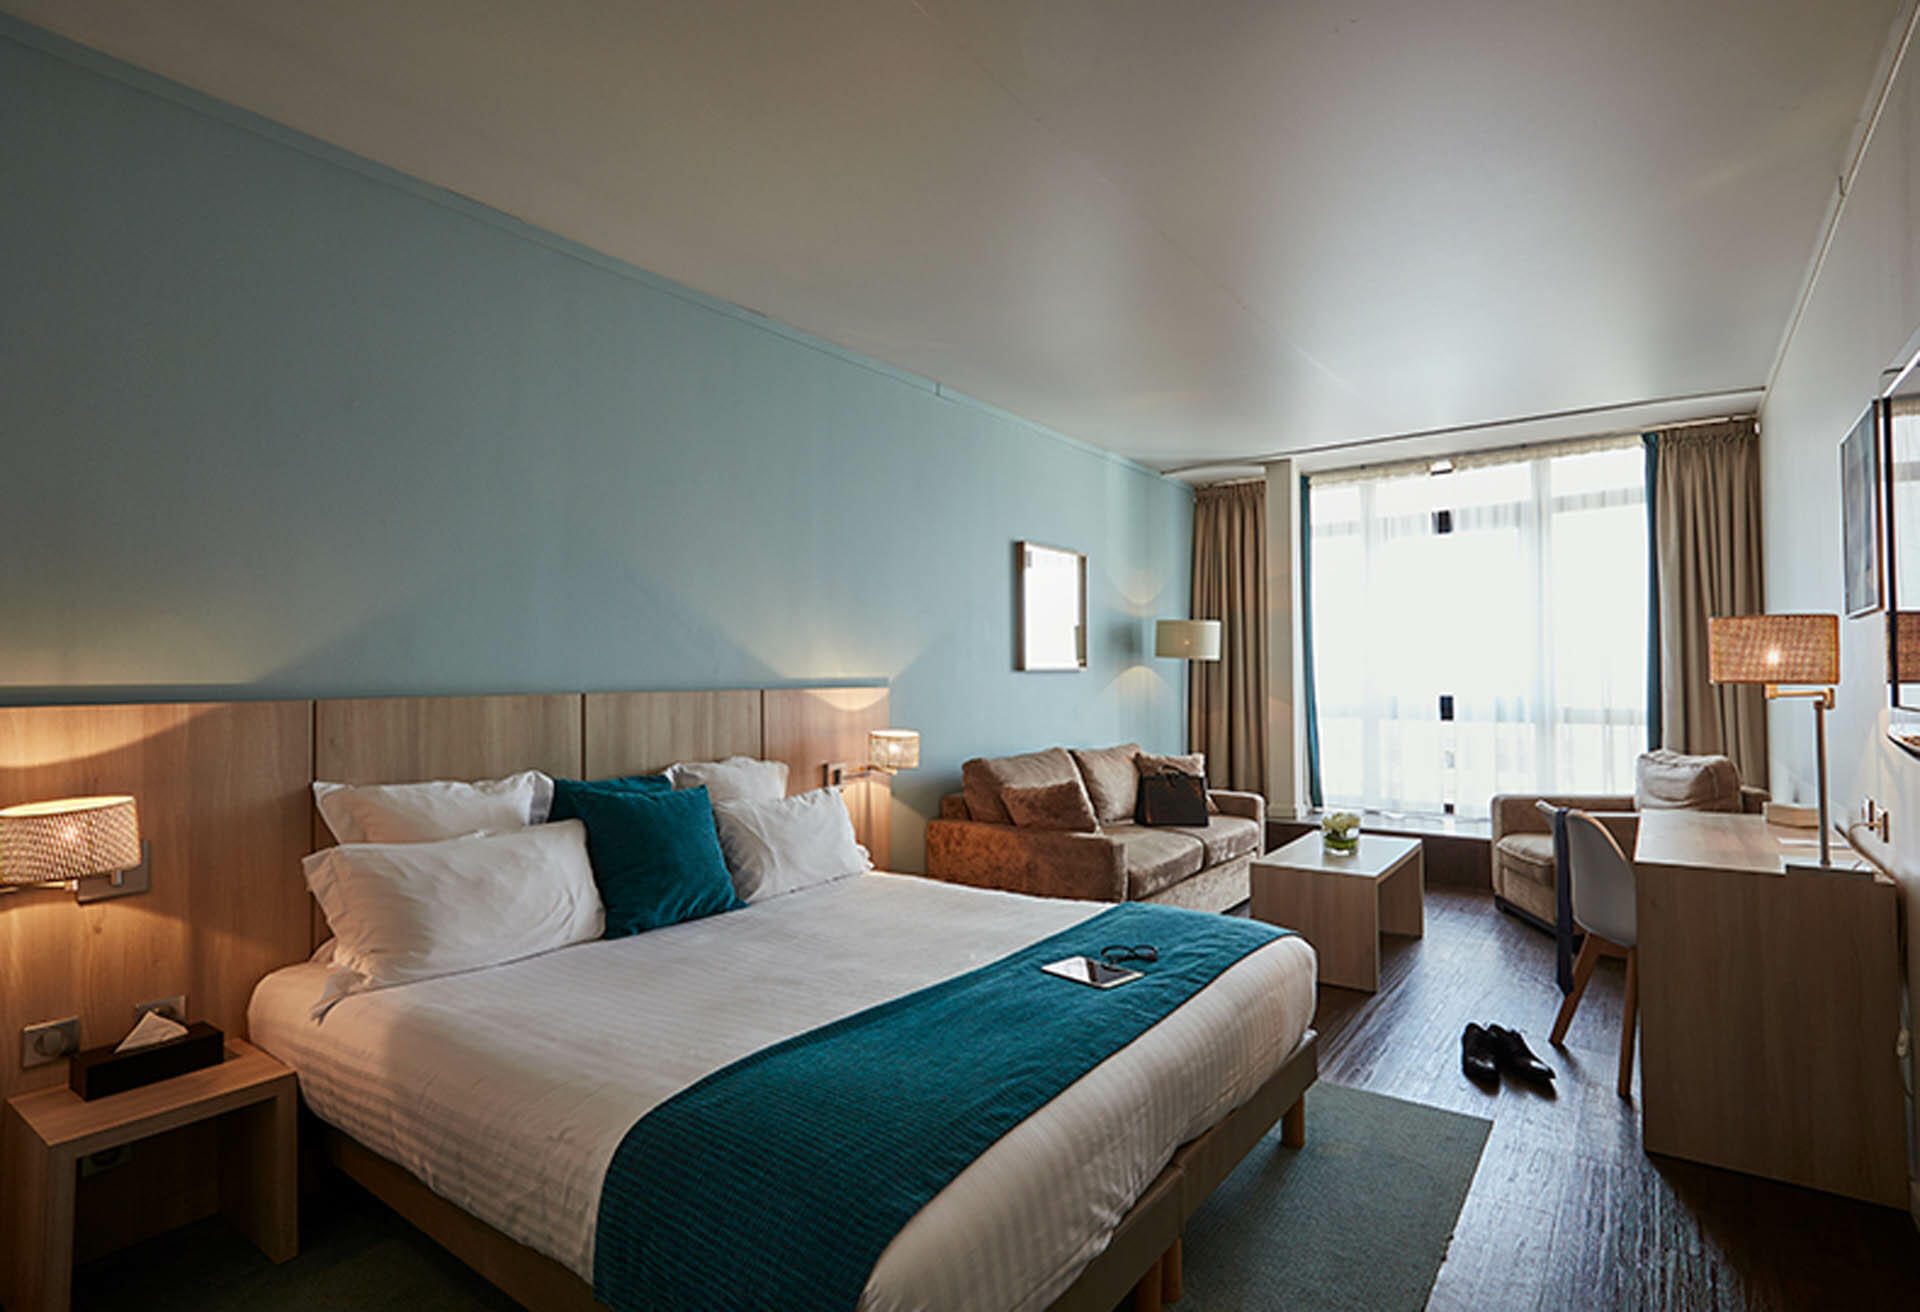 Sea View Junior Suite at Grand Hôtel du Casino in Dieppe, France